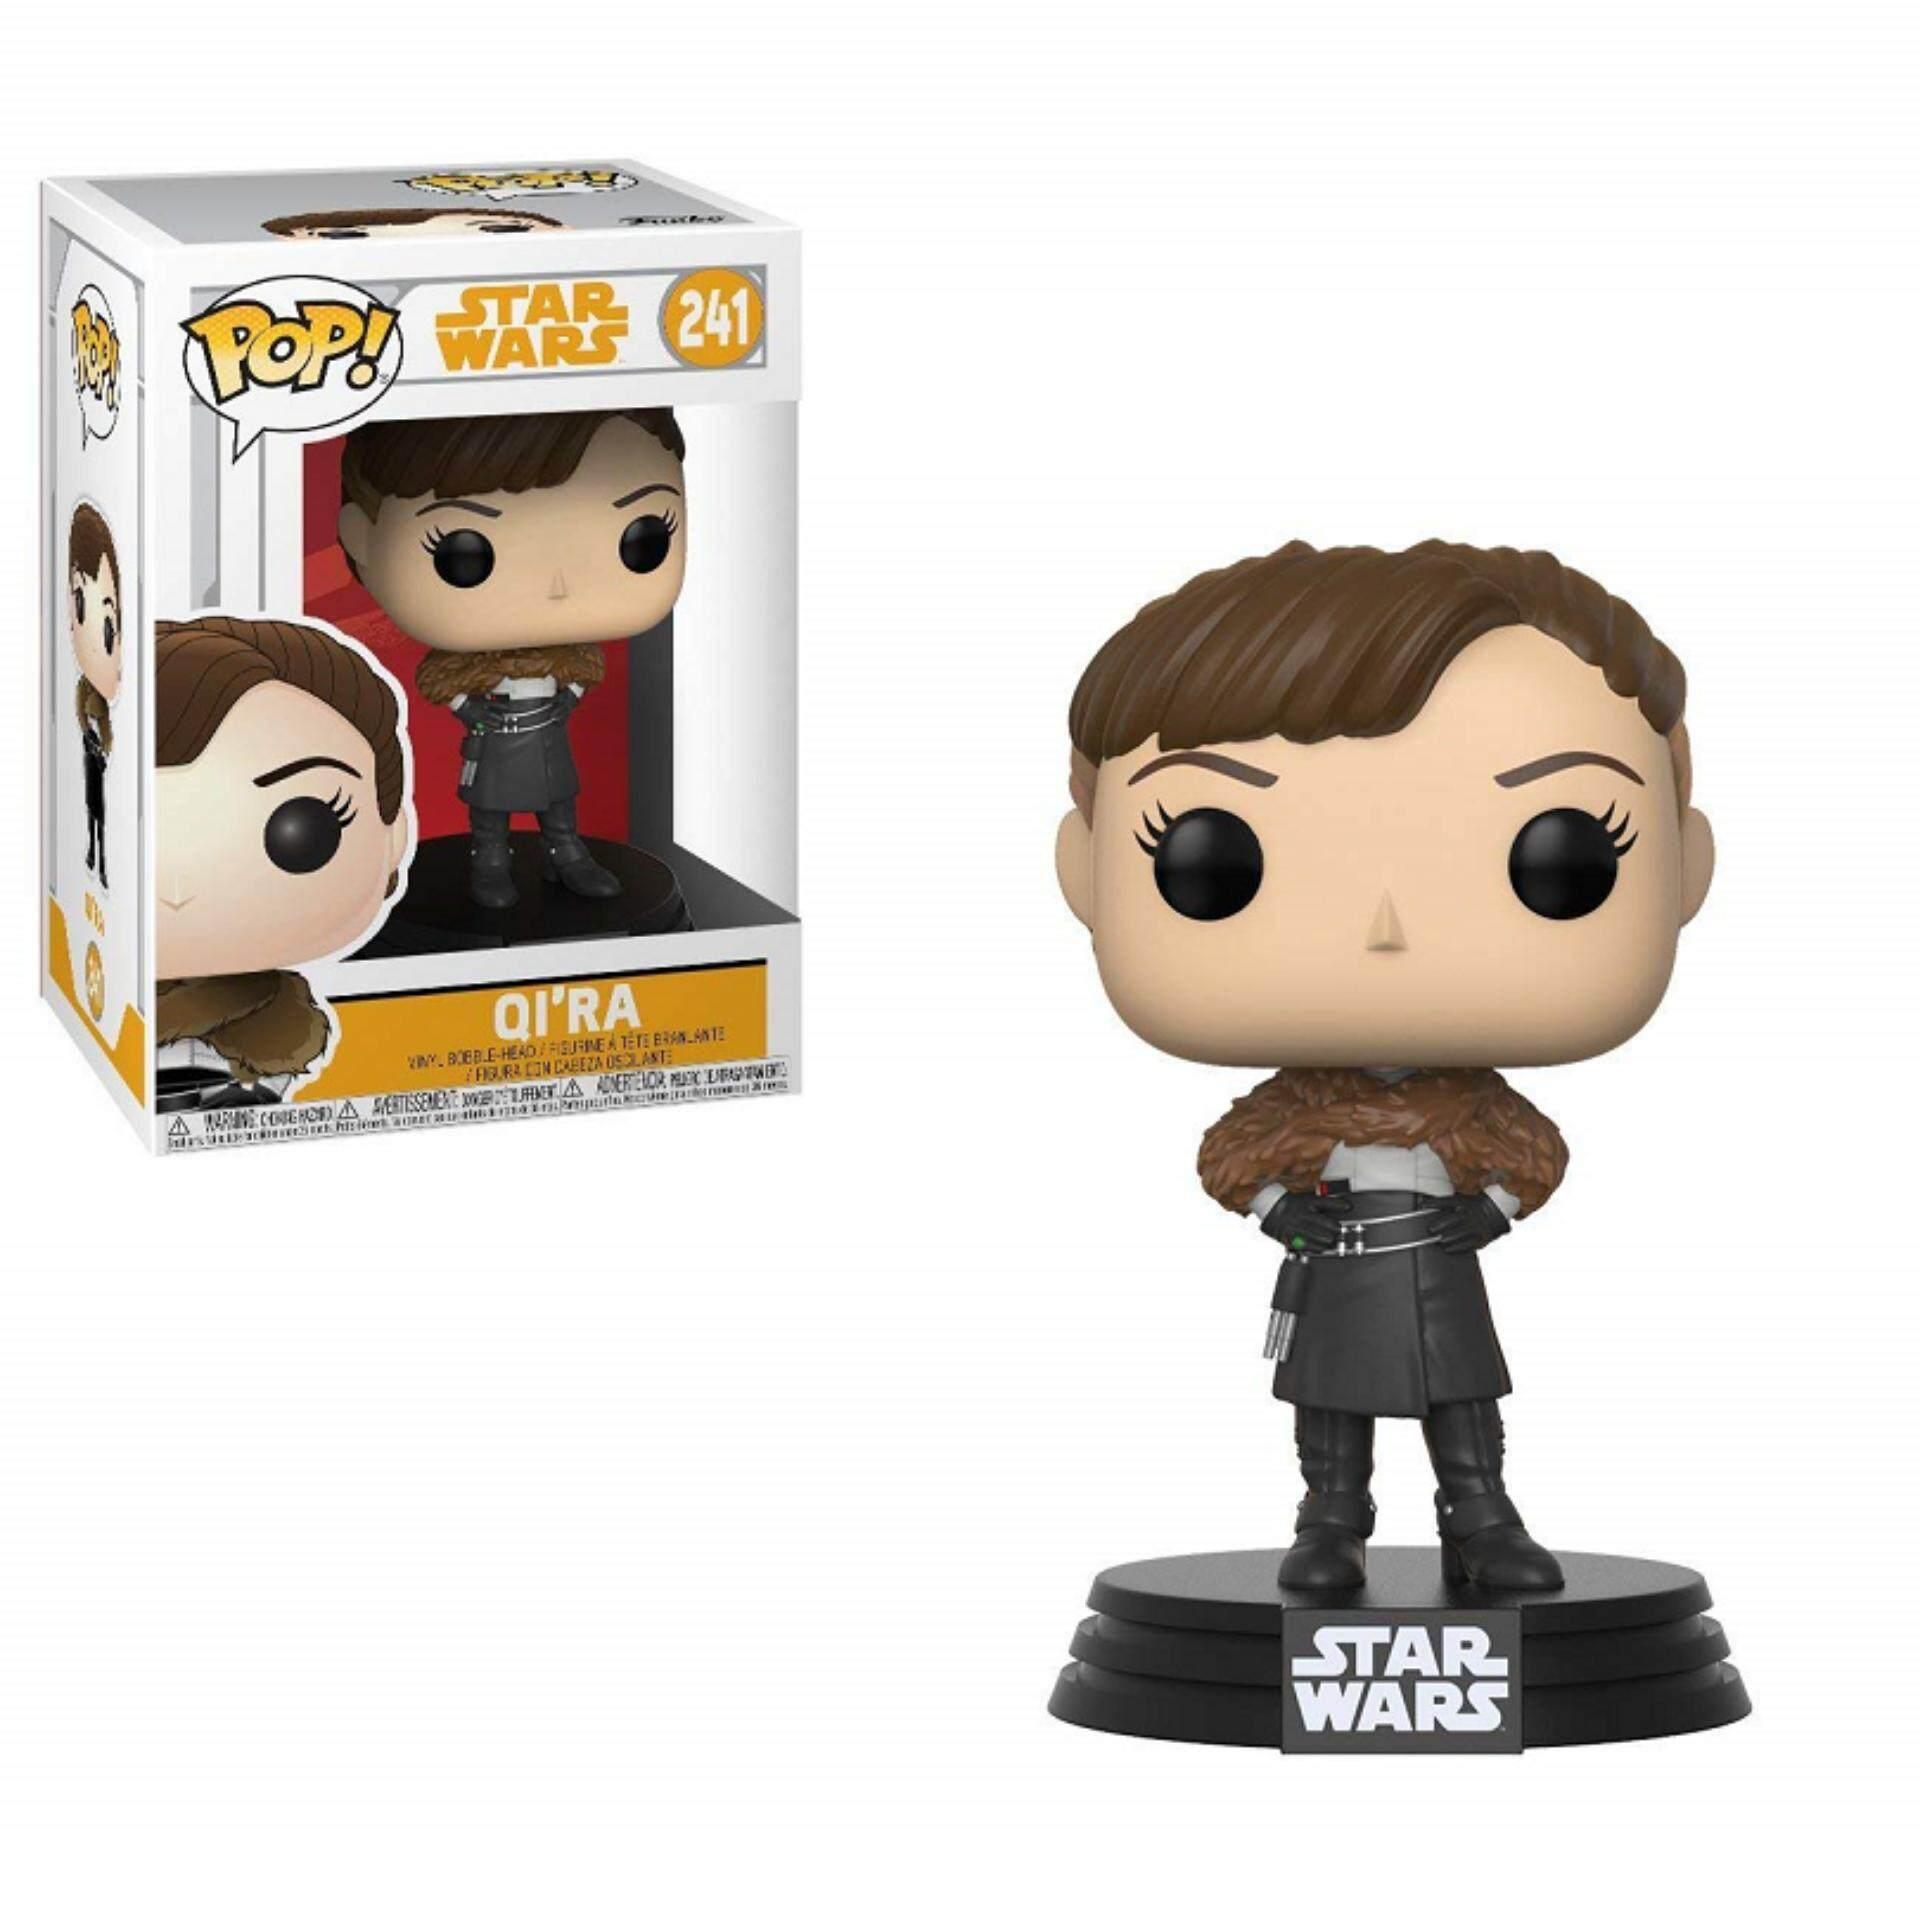 FUNKO POP! Star Wars Solo Figure - QiRa Toys for boys